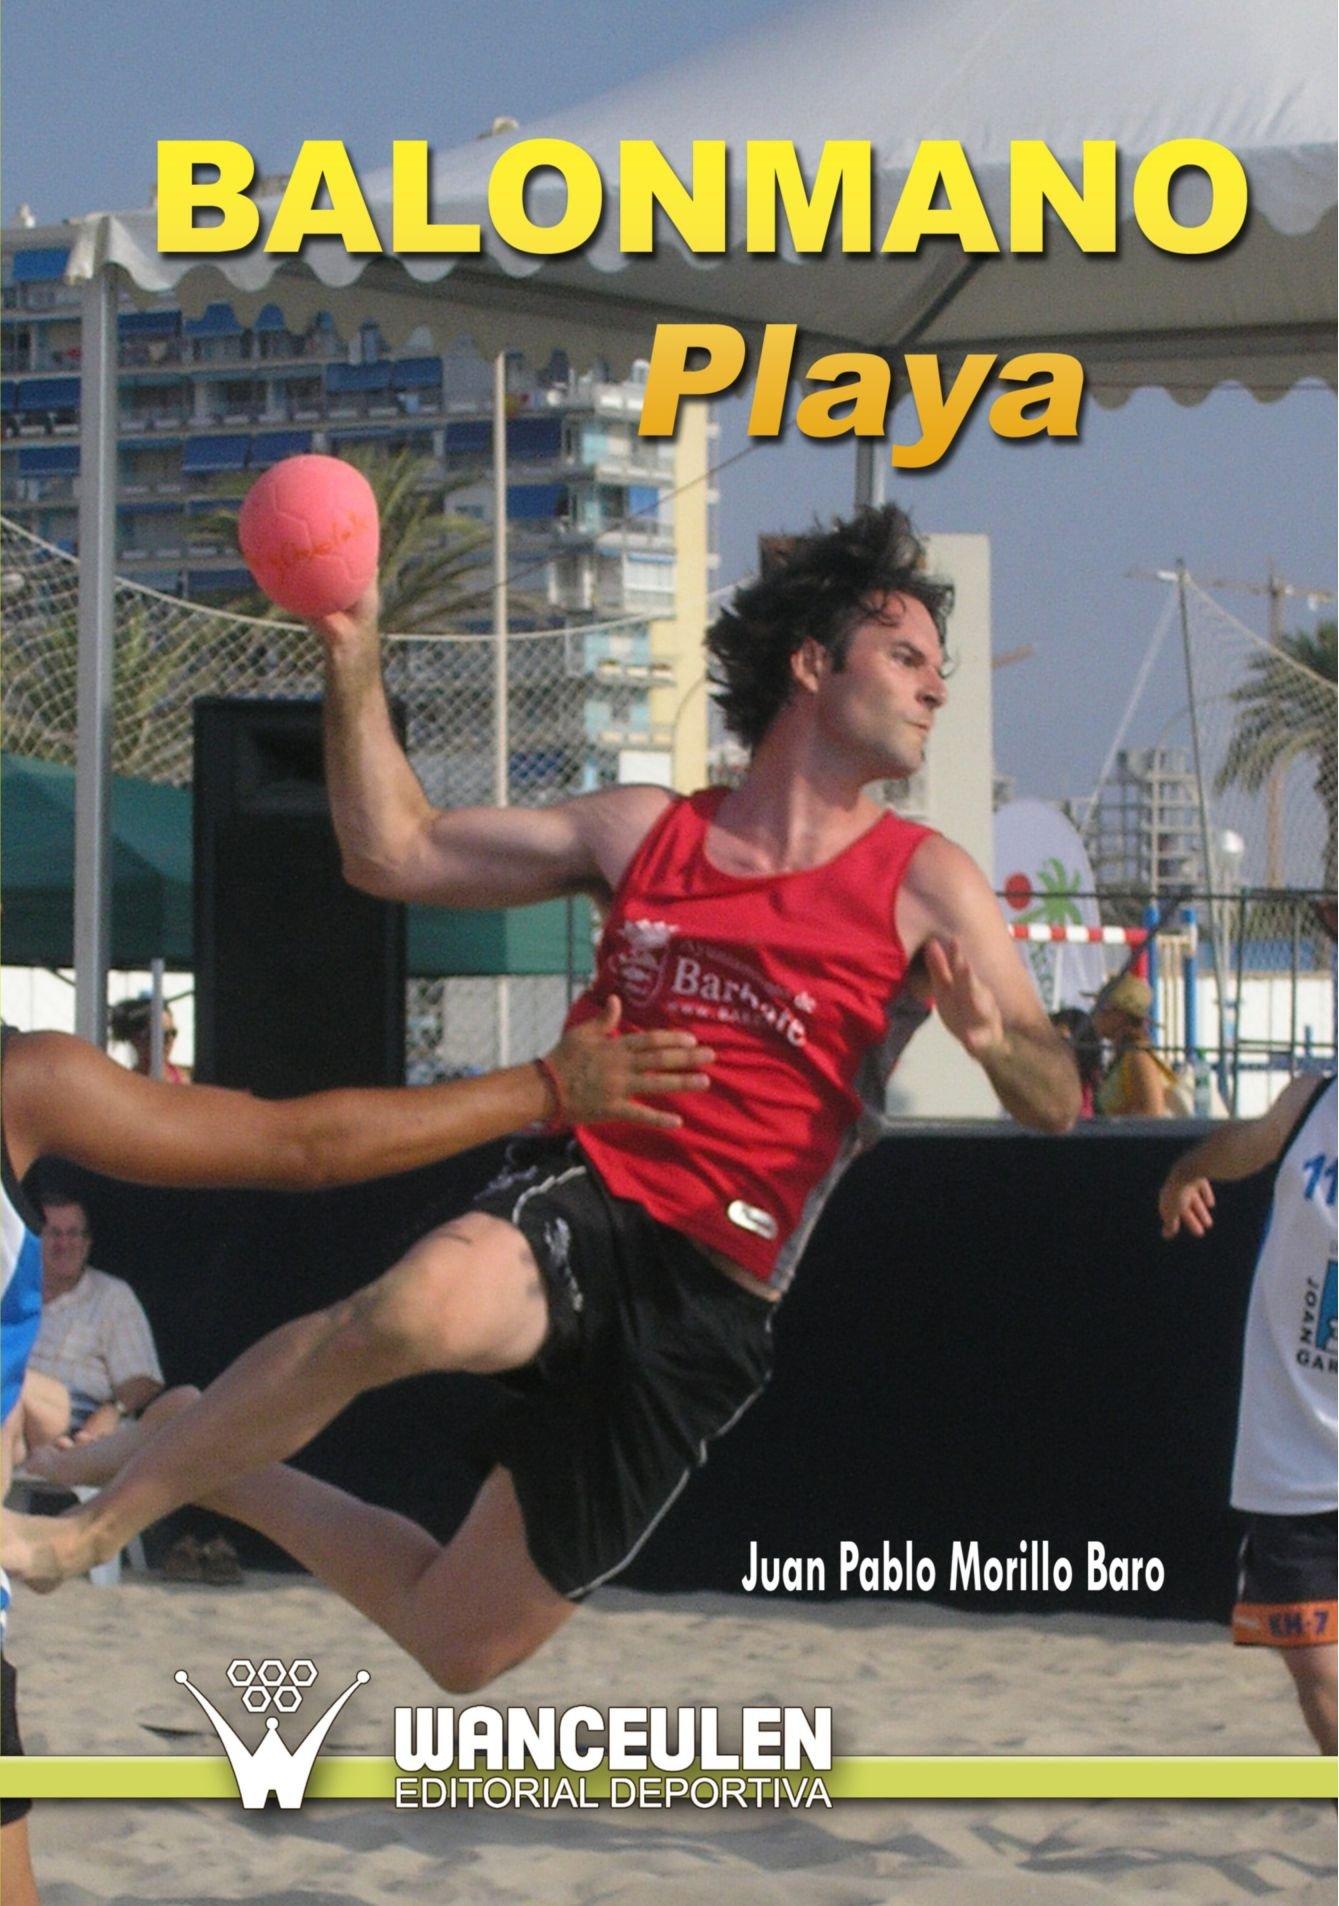 Balonmano Playa (Spanish Edition): Juan Pablo Morillo Baro ...